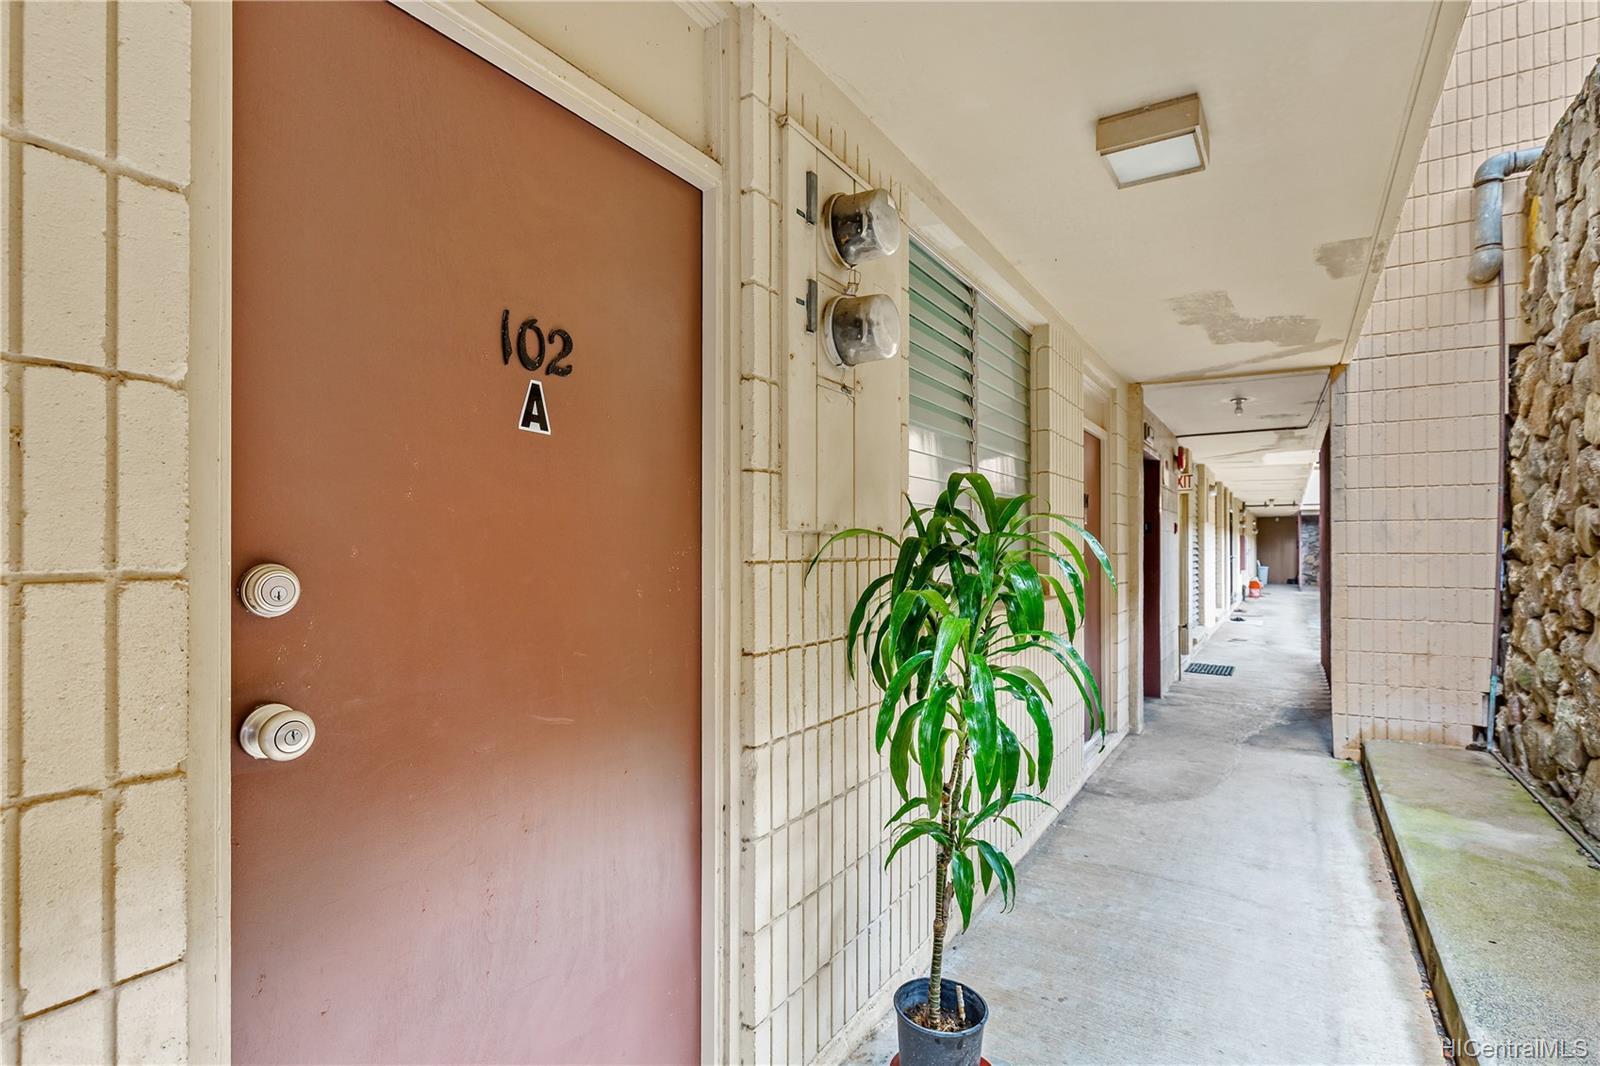 Palolo garden condo # 102A, Honolulu, Hawaii - photo 8 of 10